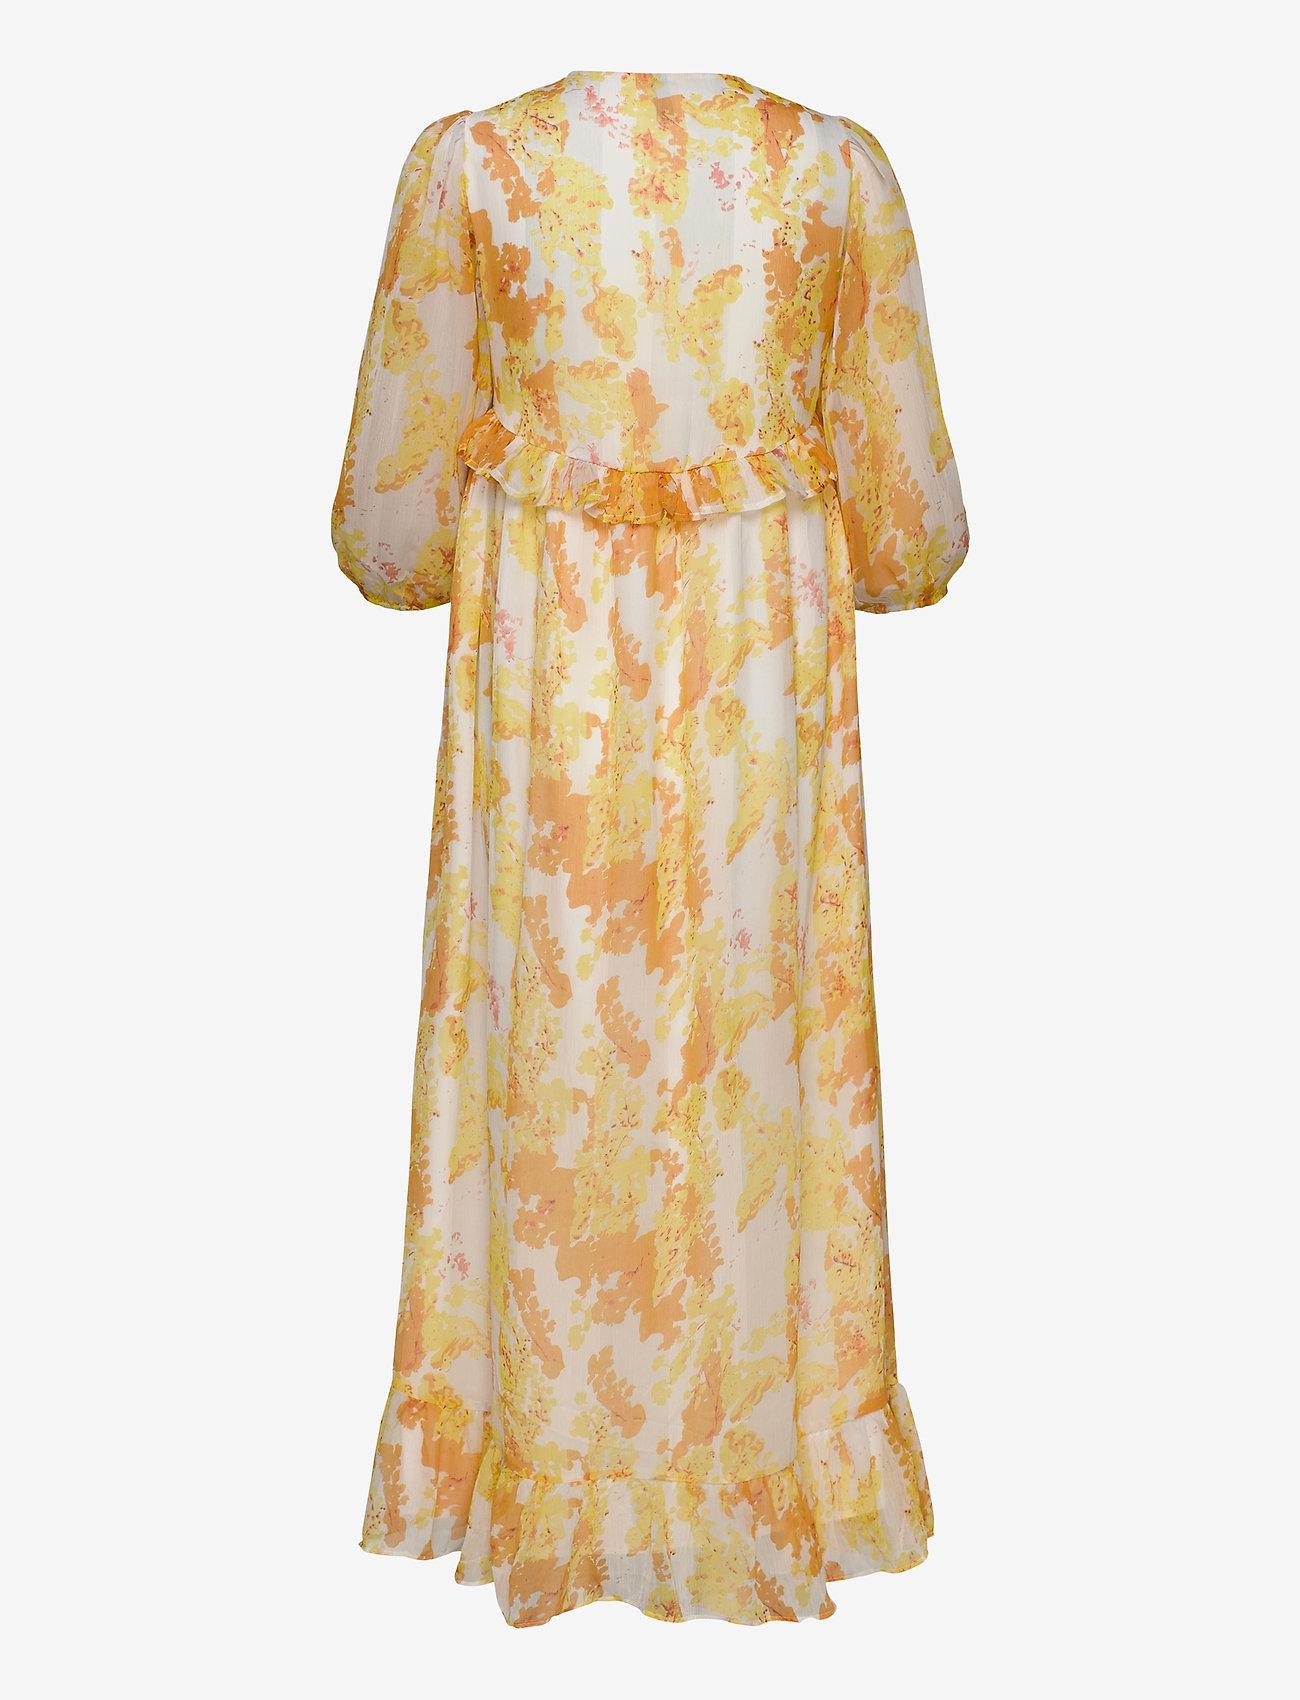 Yascitrus 3/4 Ankle Dress S. (Star White) (79.99 €) - YAS 02bgn9lR